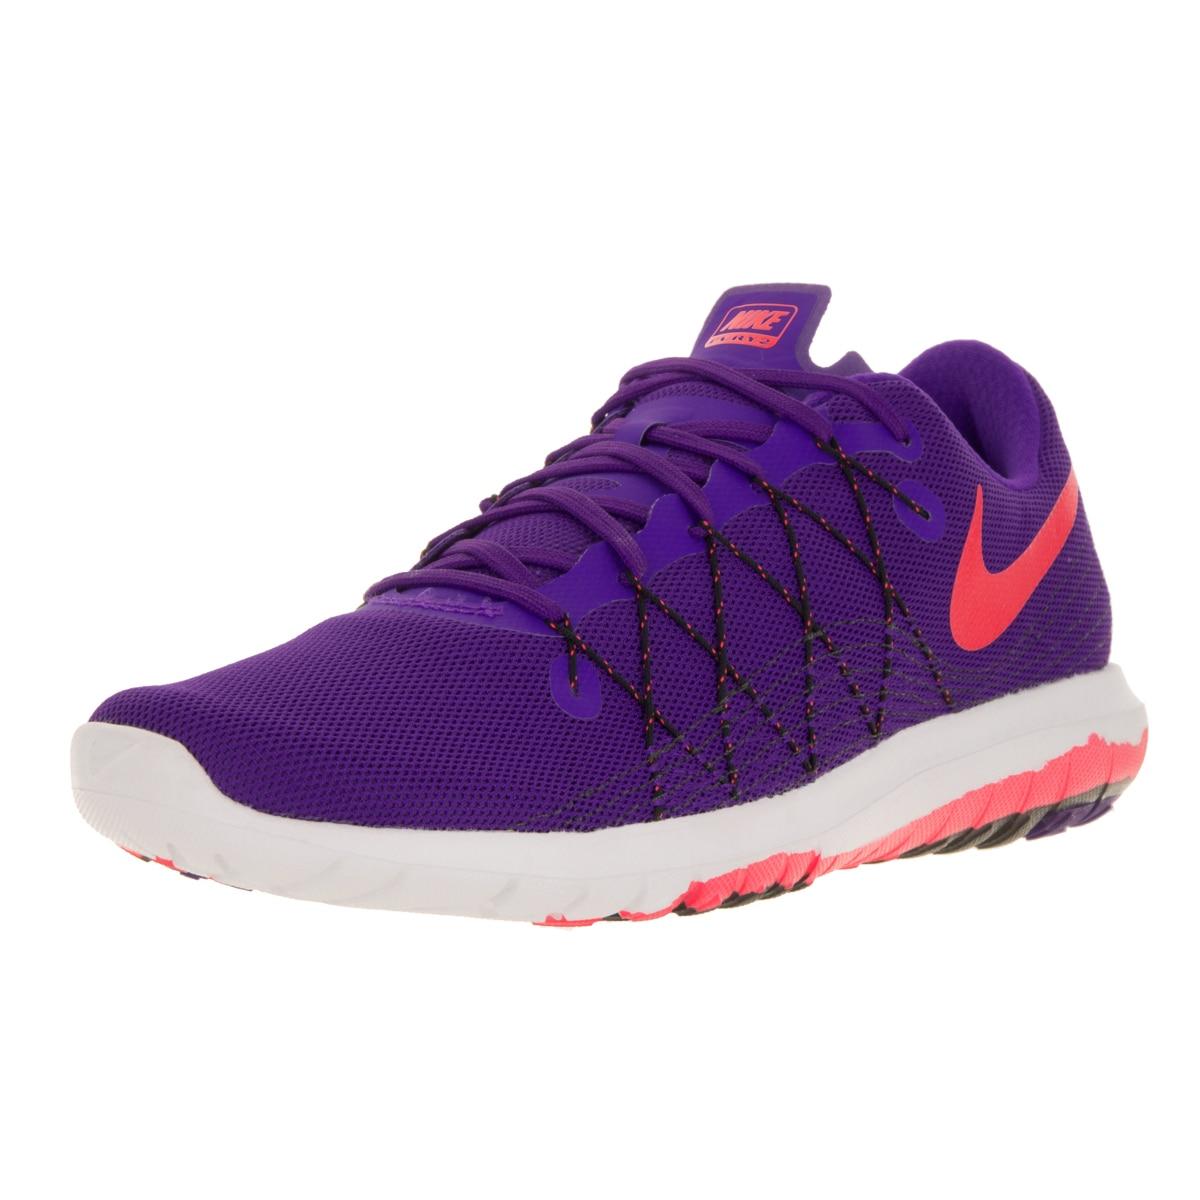 Nike Women's Flex Fury 2 Purple, Bright Crimson, Black, a...